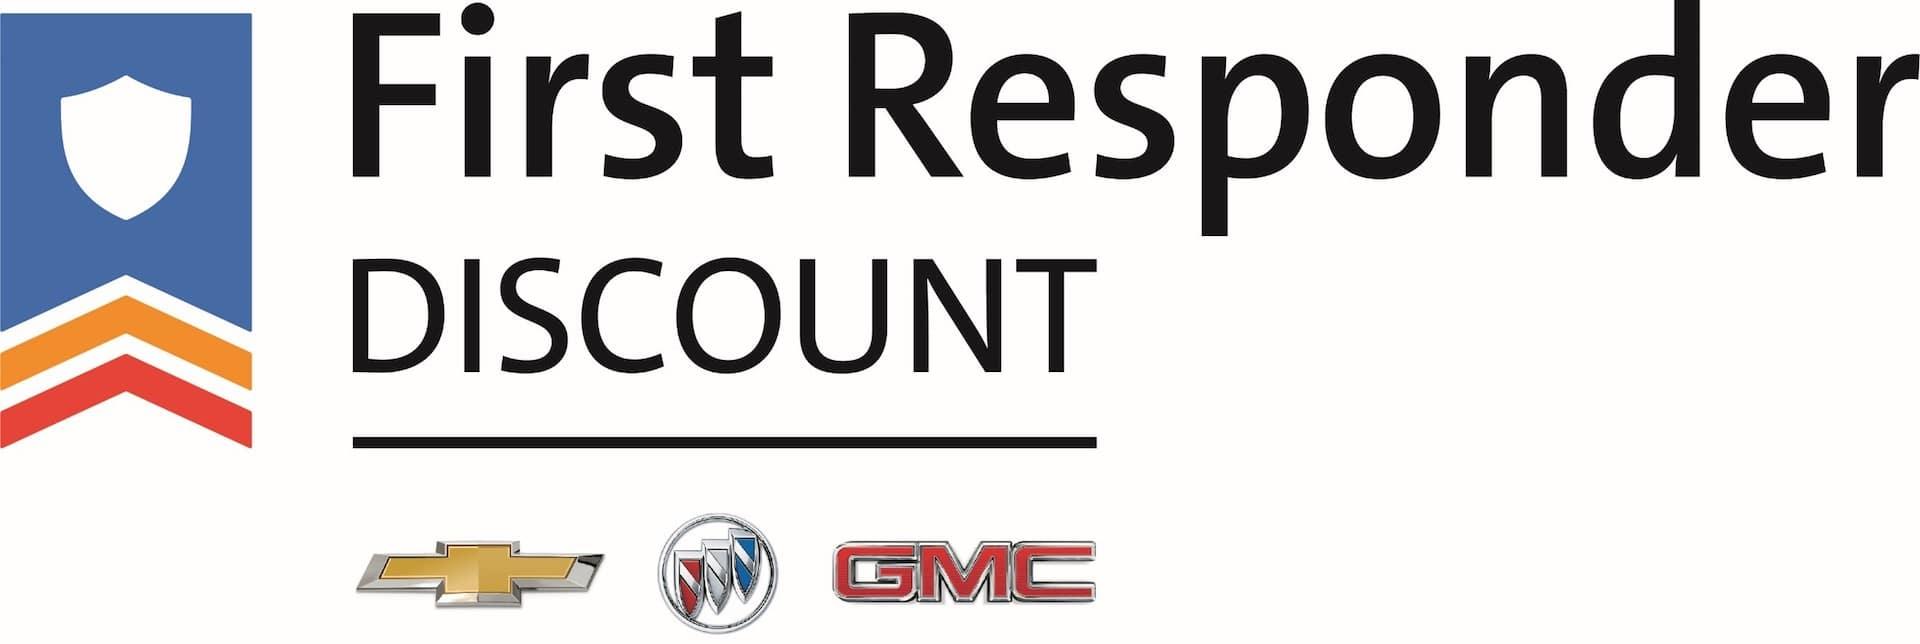 gm first responder logo